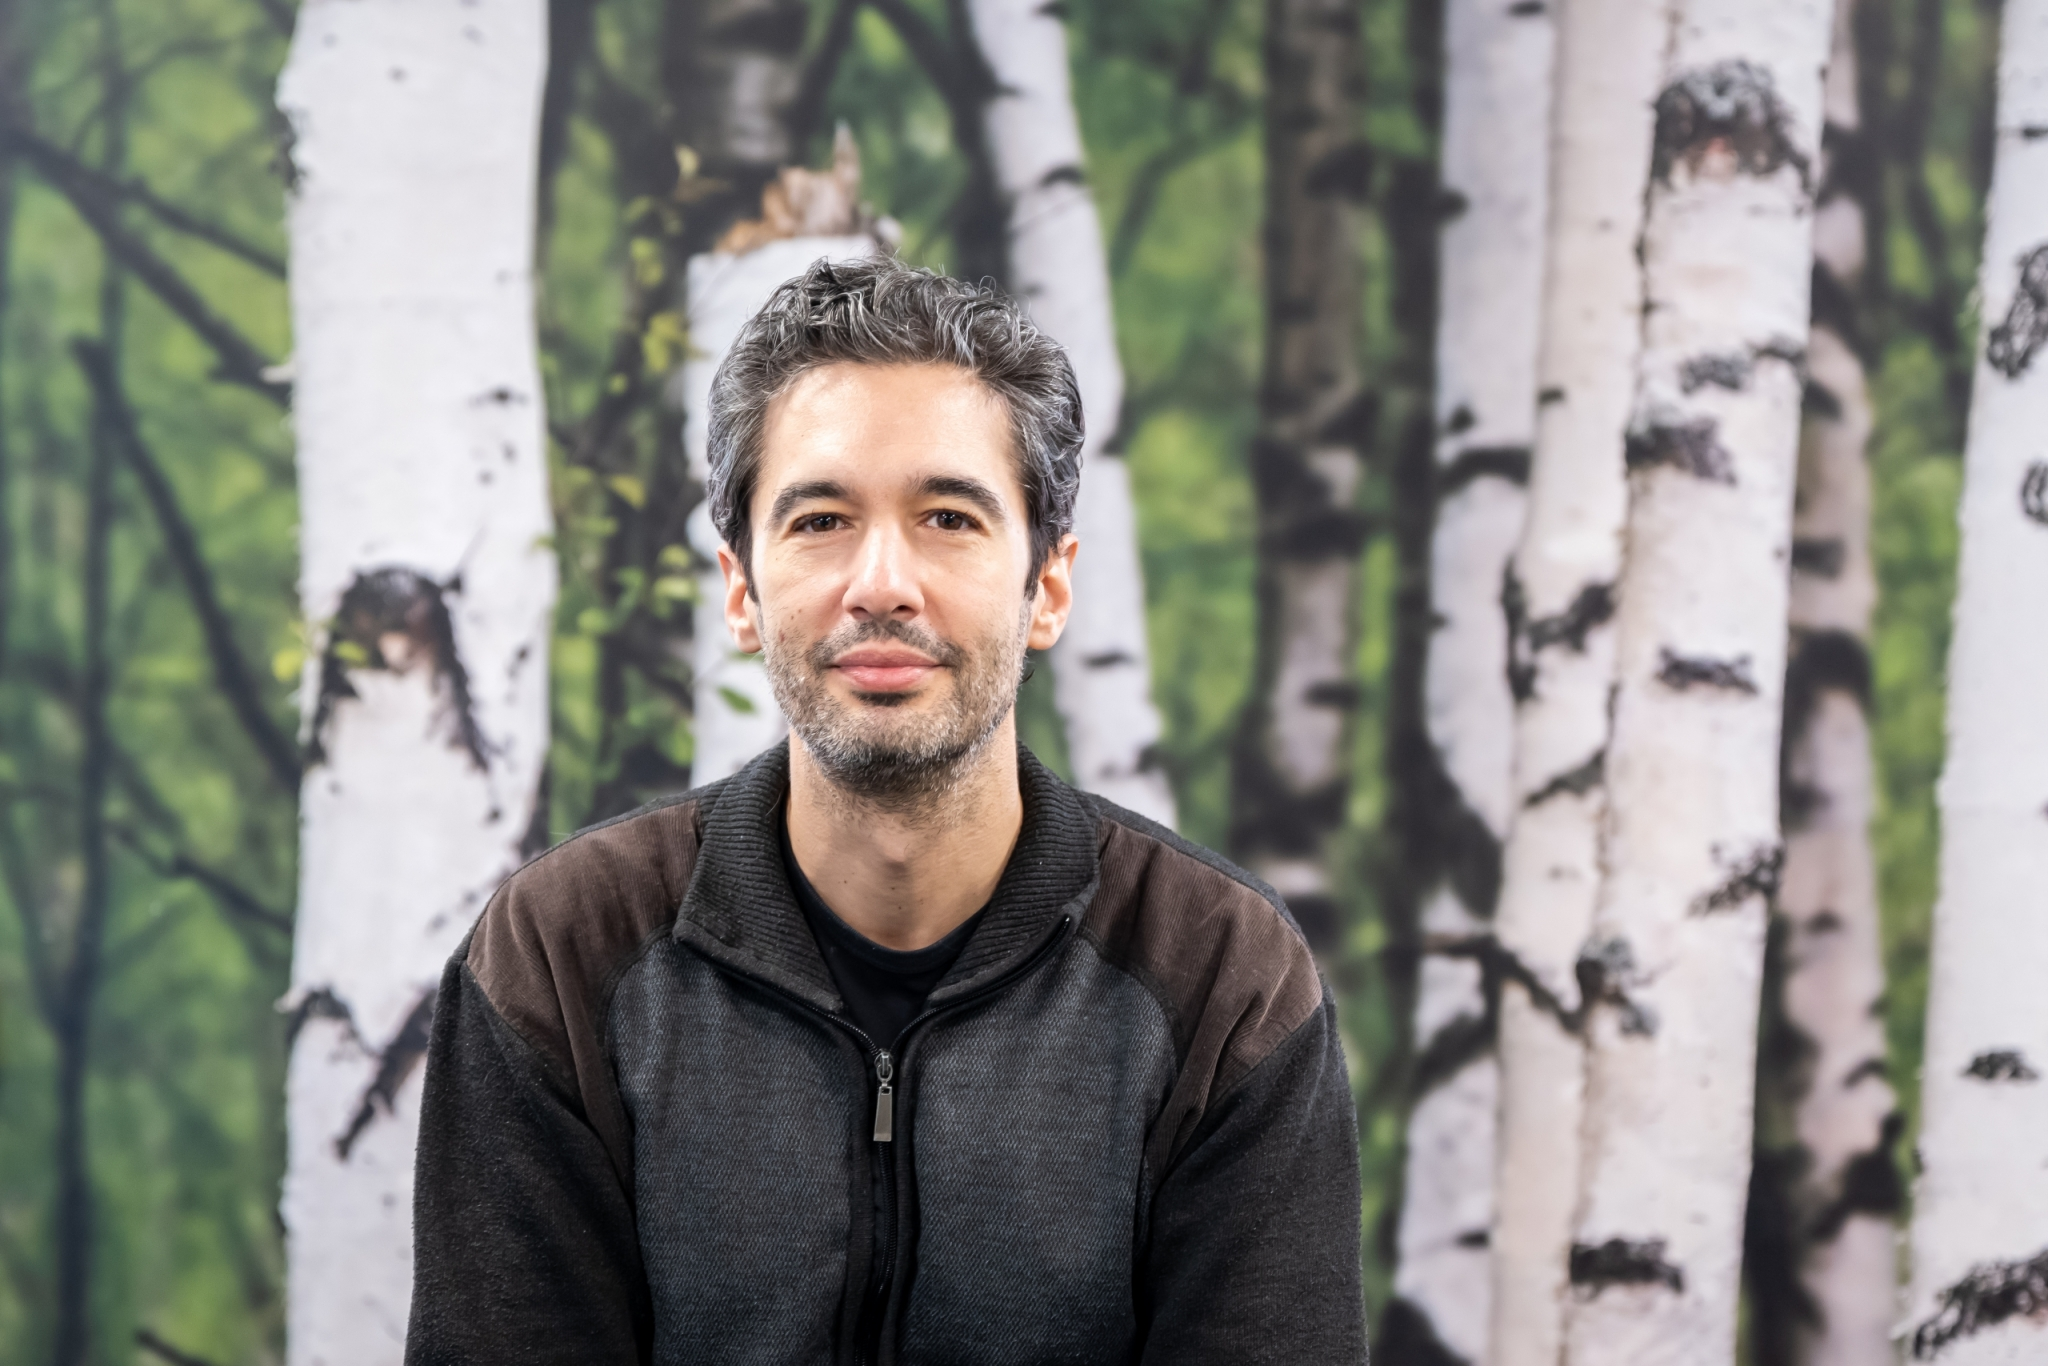 Felipe Cava with a birch tree background